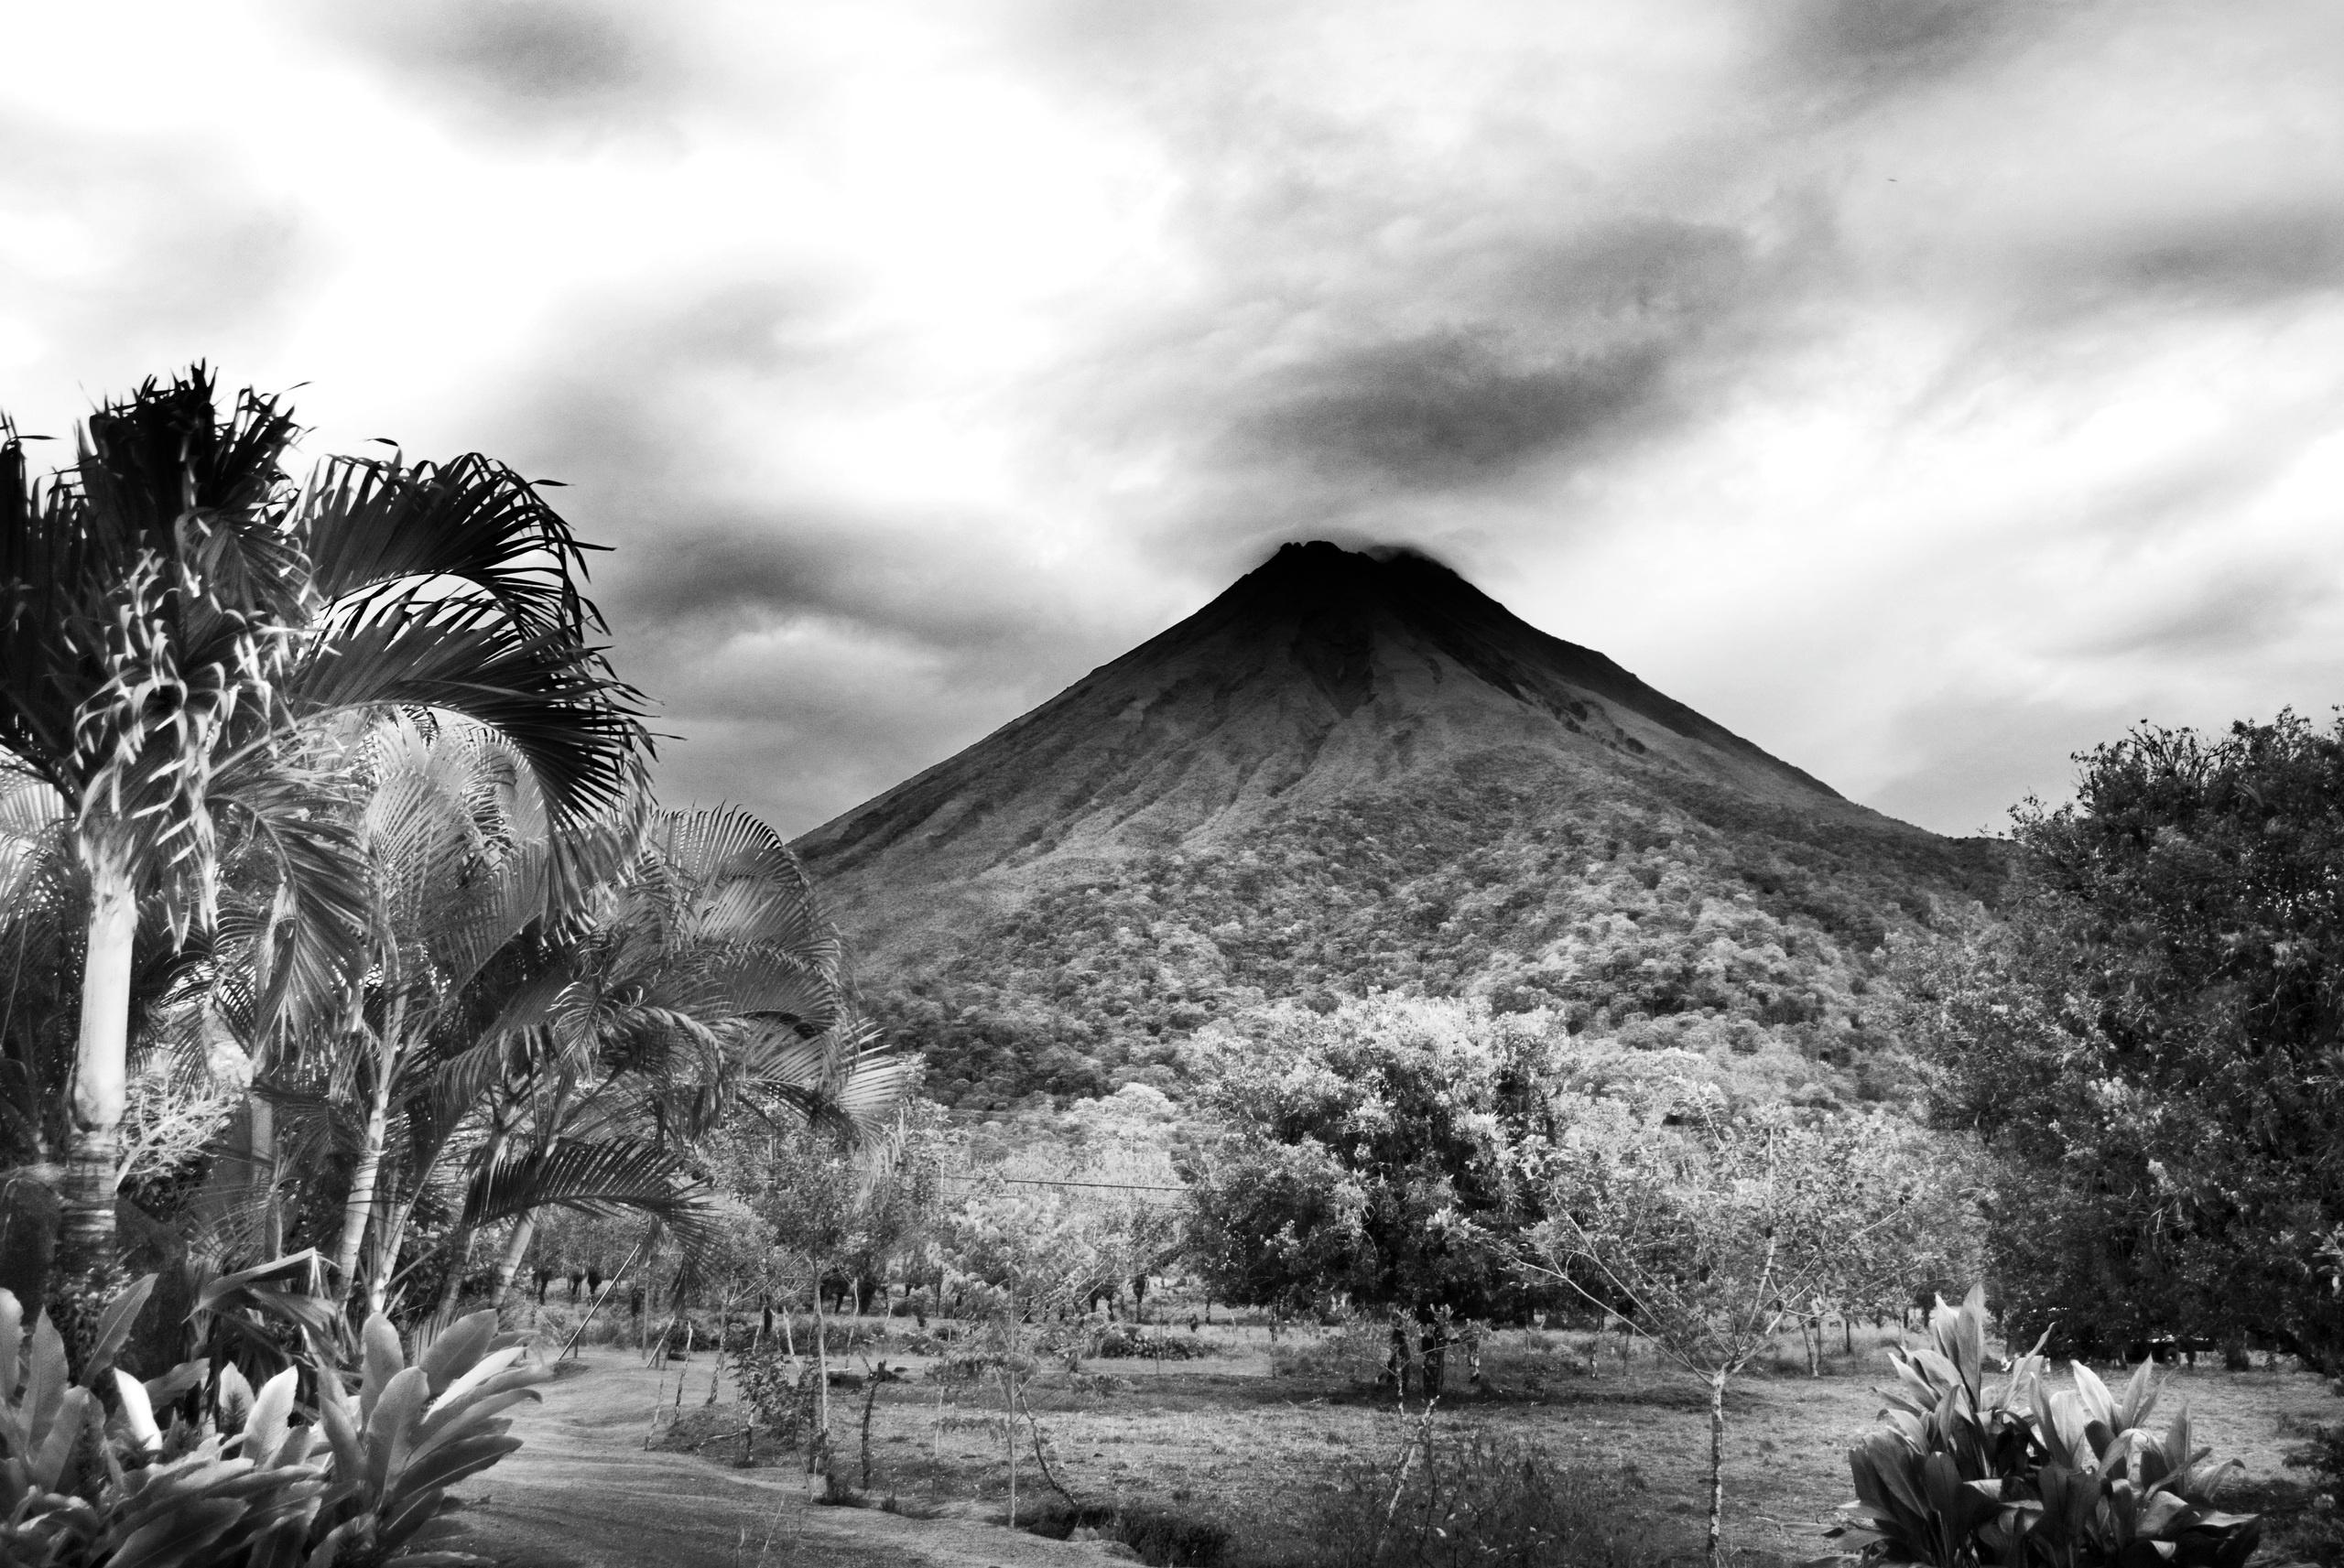 PhotoFly Travel Club | *Costa Rica1 | PhotoFly Travel Club